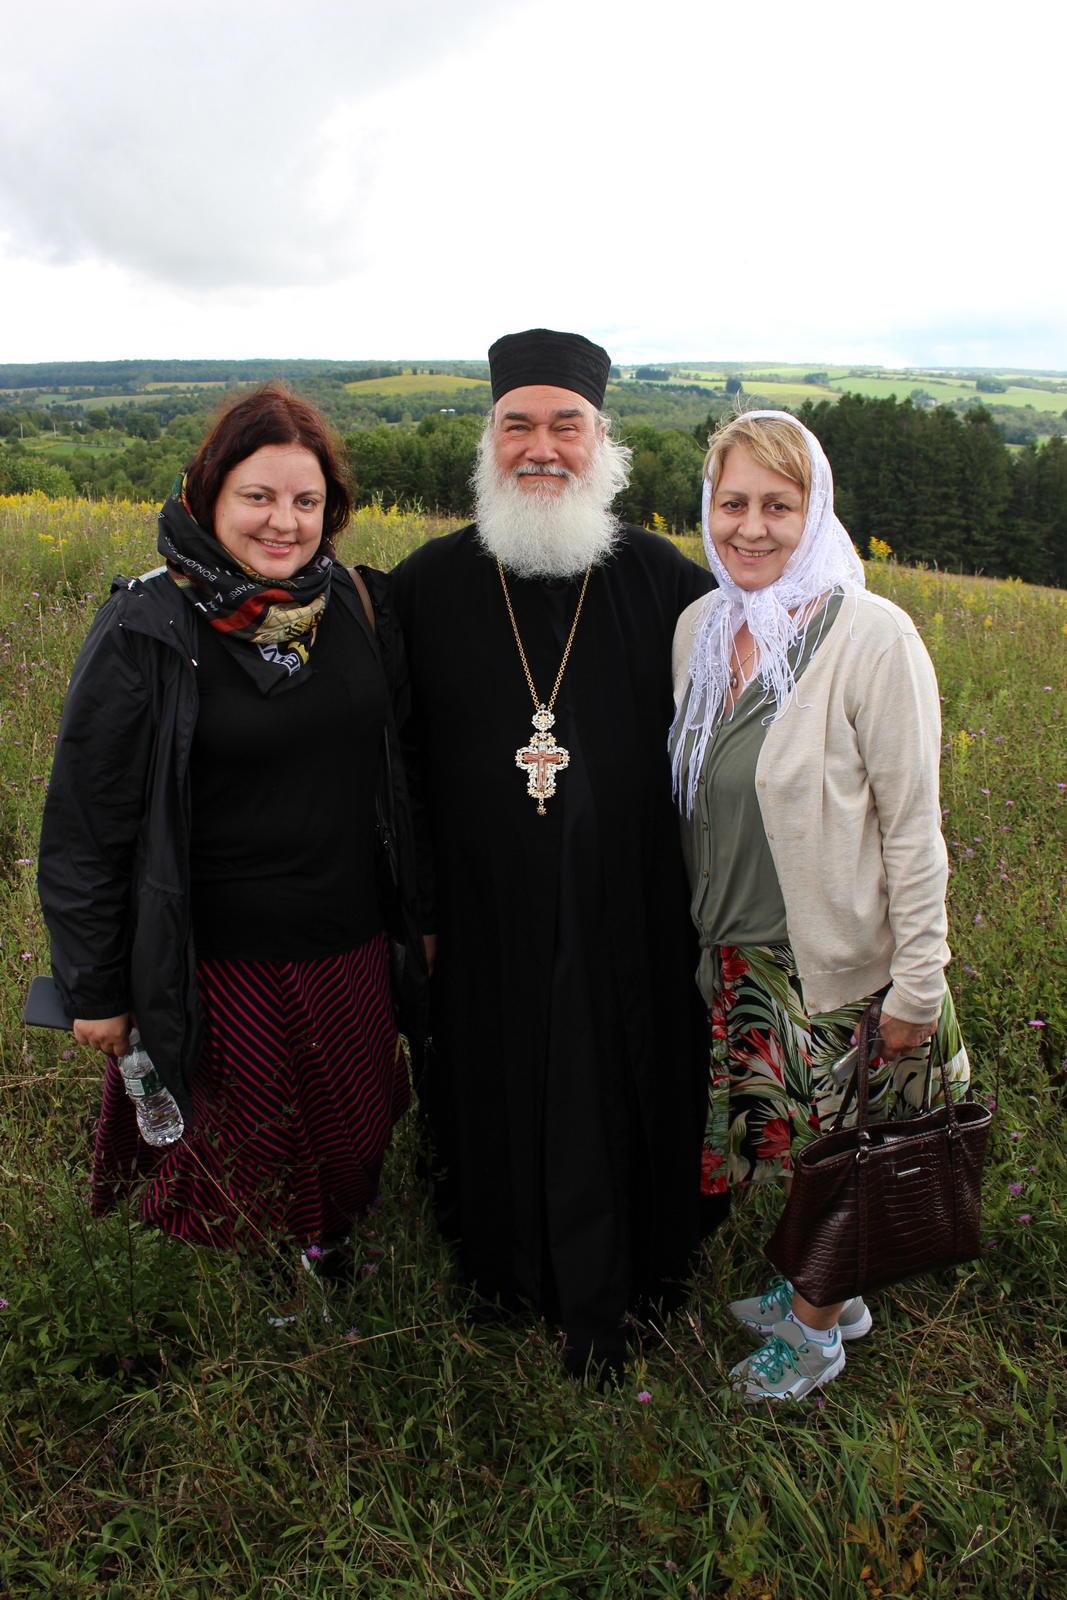 St-Trinity-monastery_02-Sept-2019_3-d-day_107